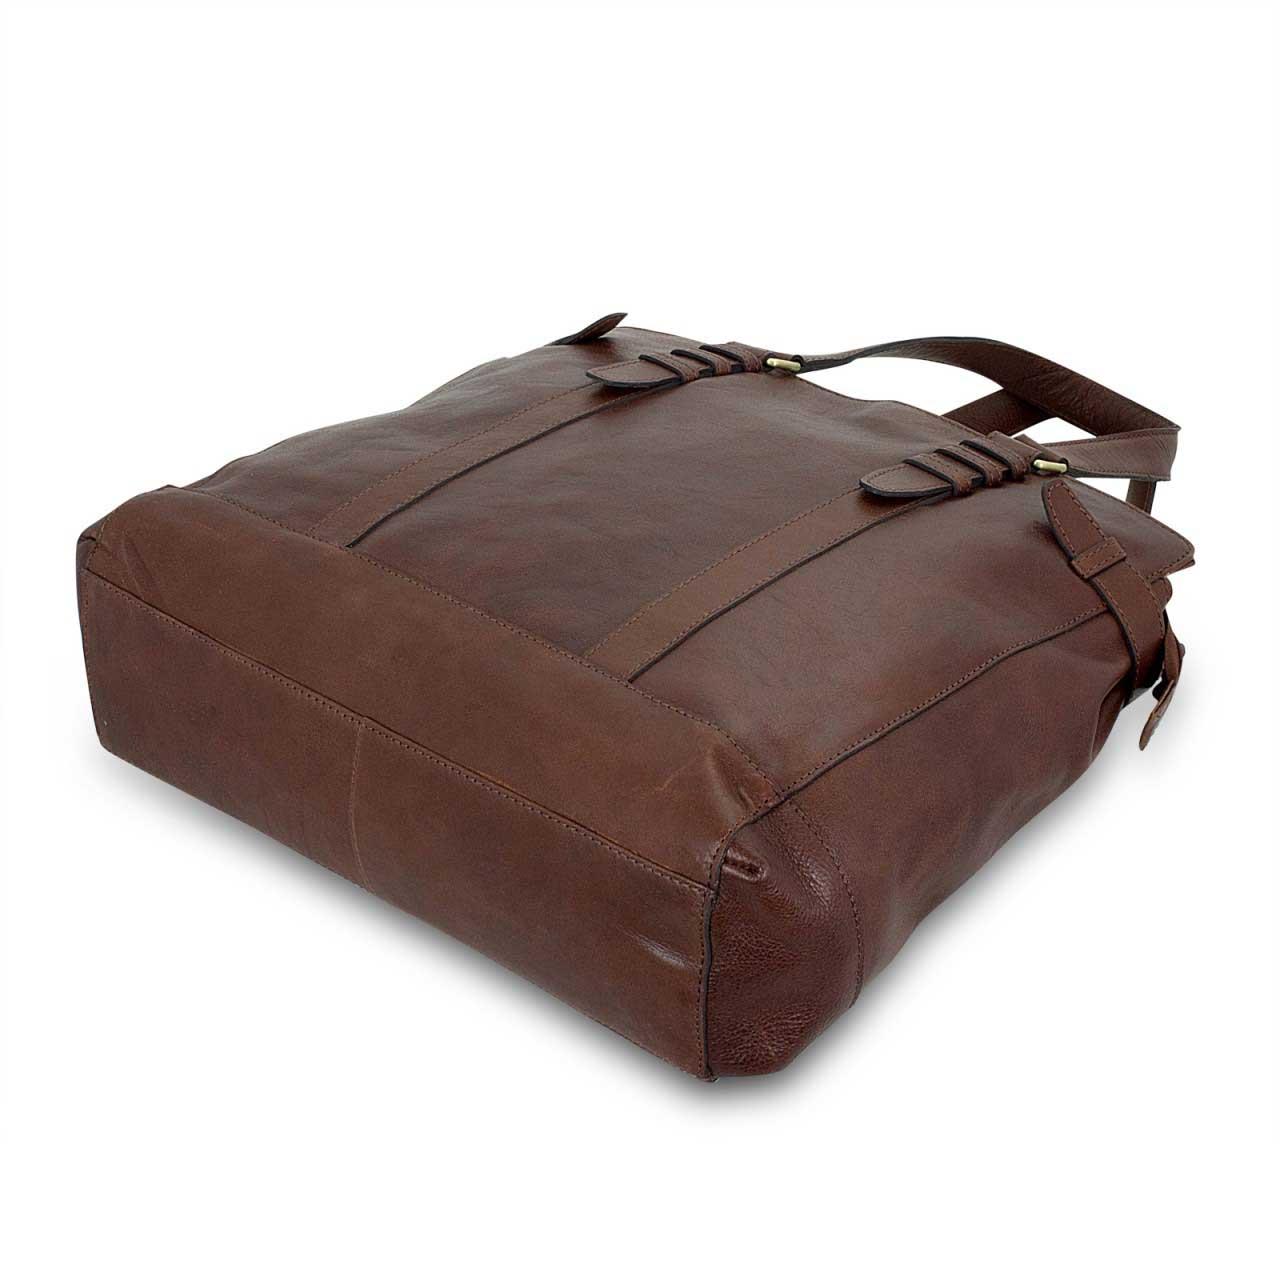 STILORD Große Damenhandtasche Leder 34 x 35 x 9 cm dunkelbraun - Bild 3